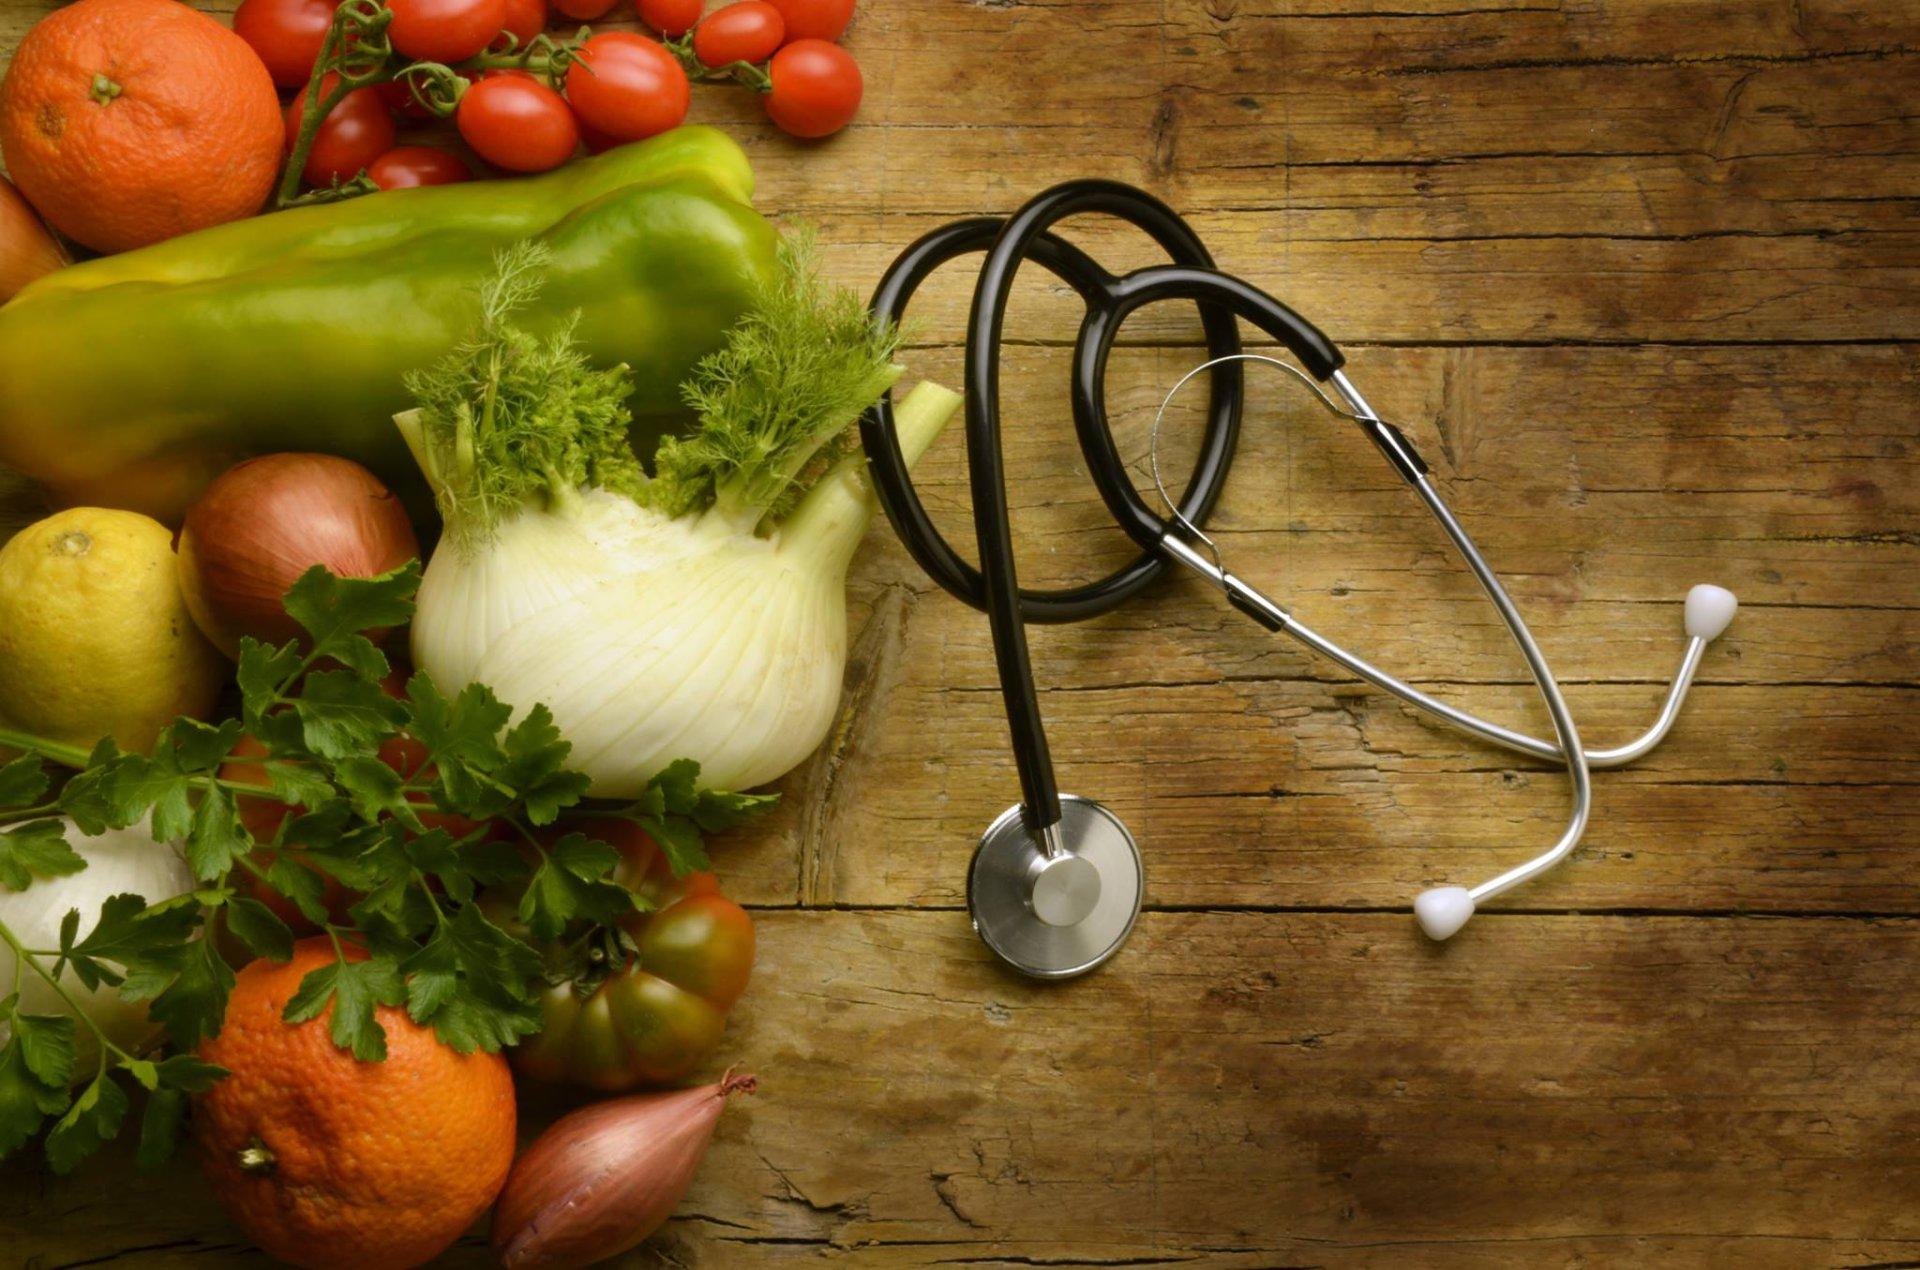 hipertenzija, mityba, druska, dieta, cukrus, kava, kalorijos - eagles.lt